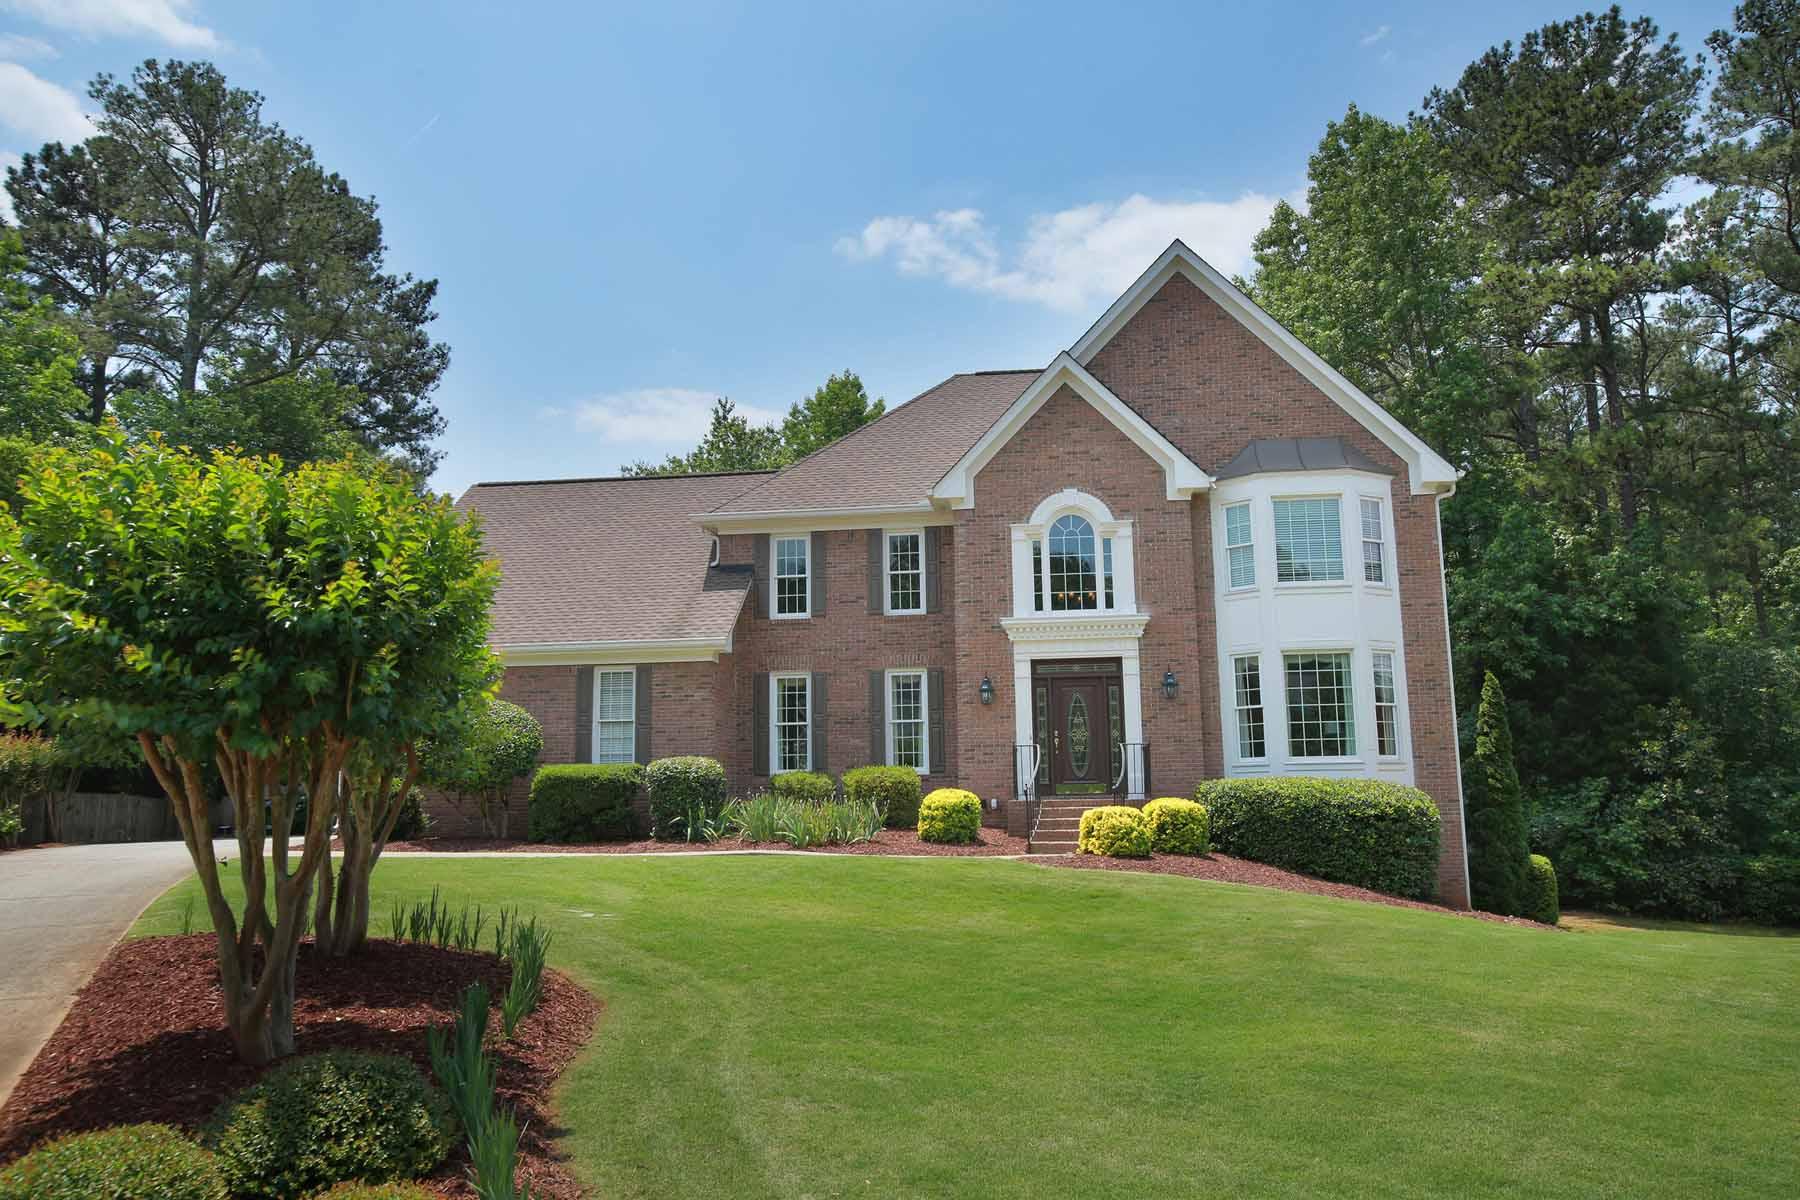 獨棟家庭住宅 為 出售 在 This Home is a Perfect 10 10350 Tuxford Drive Alpharetta, 喬治亞州, 30022 美國